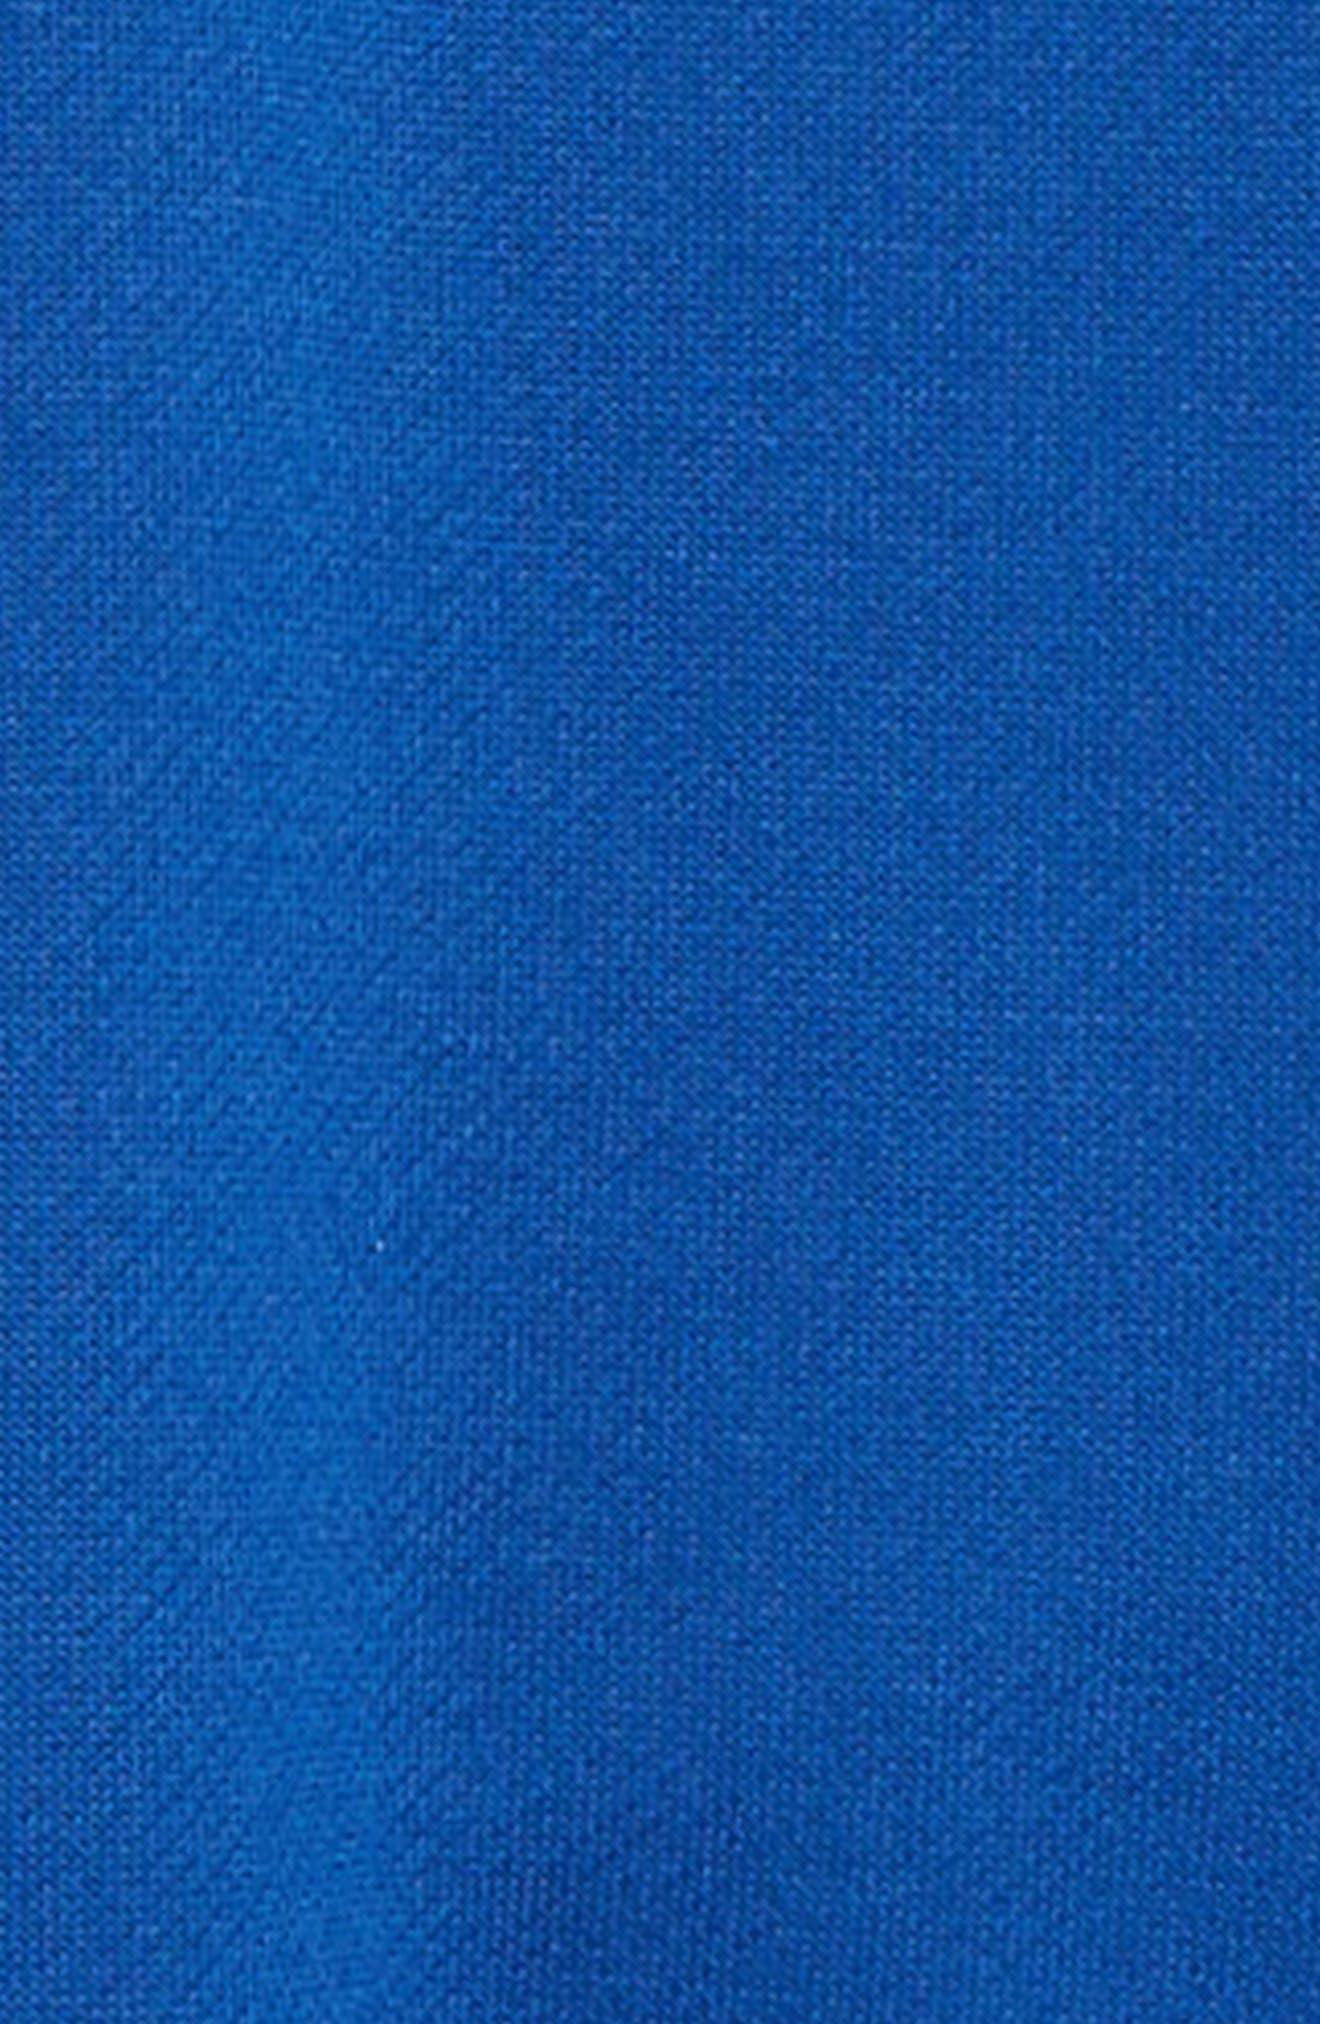 NIKE,                             Dry Fleece Training Pants,                             Alternate thumbnail 2, color,                             INDIGO FORCE/ WHITE